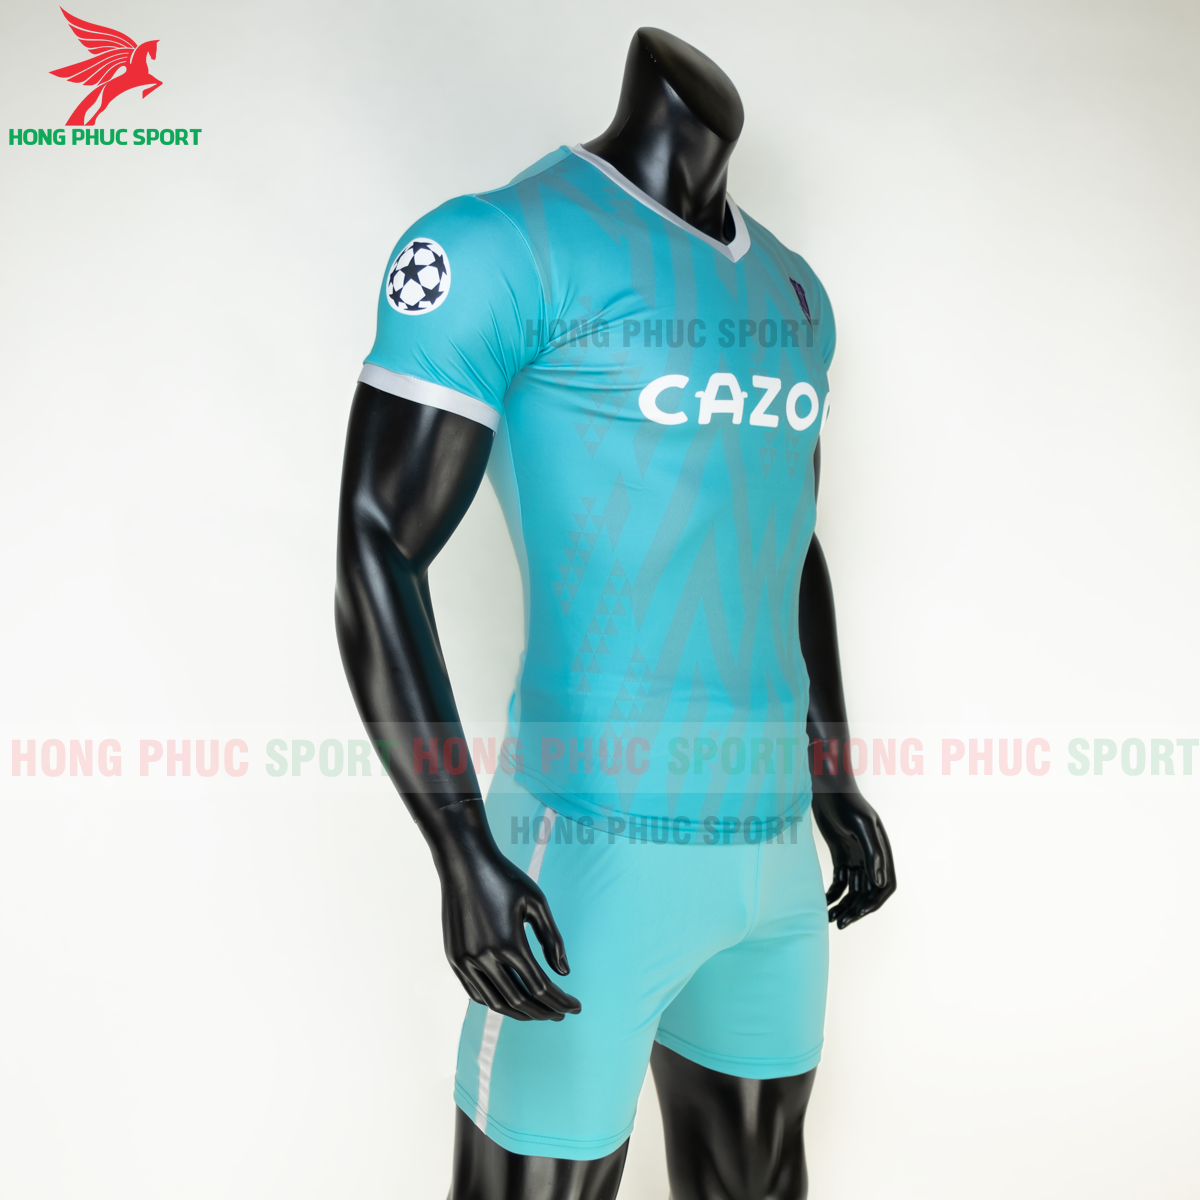 https://cdn.hongphucsport.com/unsafe/s4.shopbay.vn/files/285/ao-da-bong-everton-2020-2021-phien-ban-fan-6-5fe1a681d141f.png